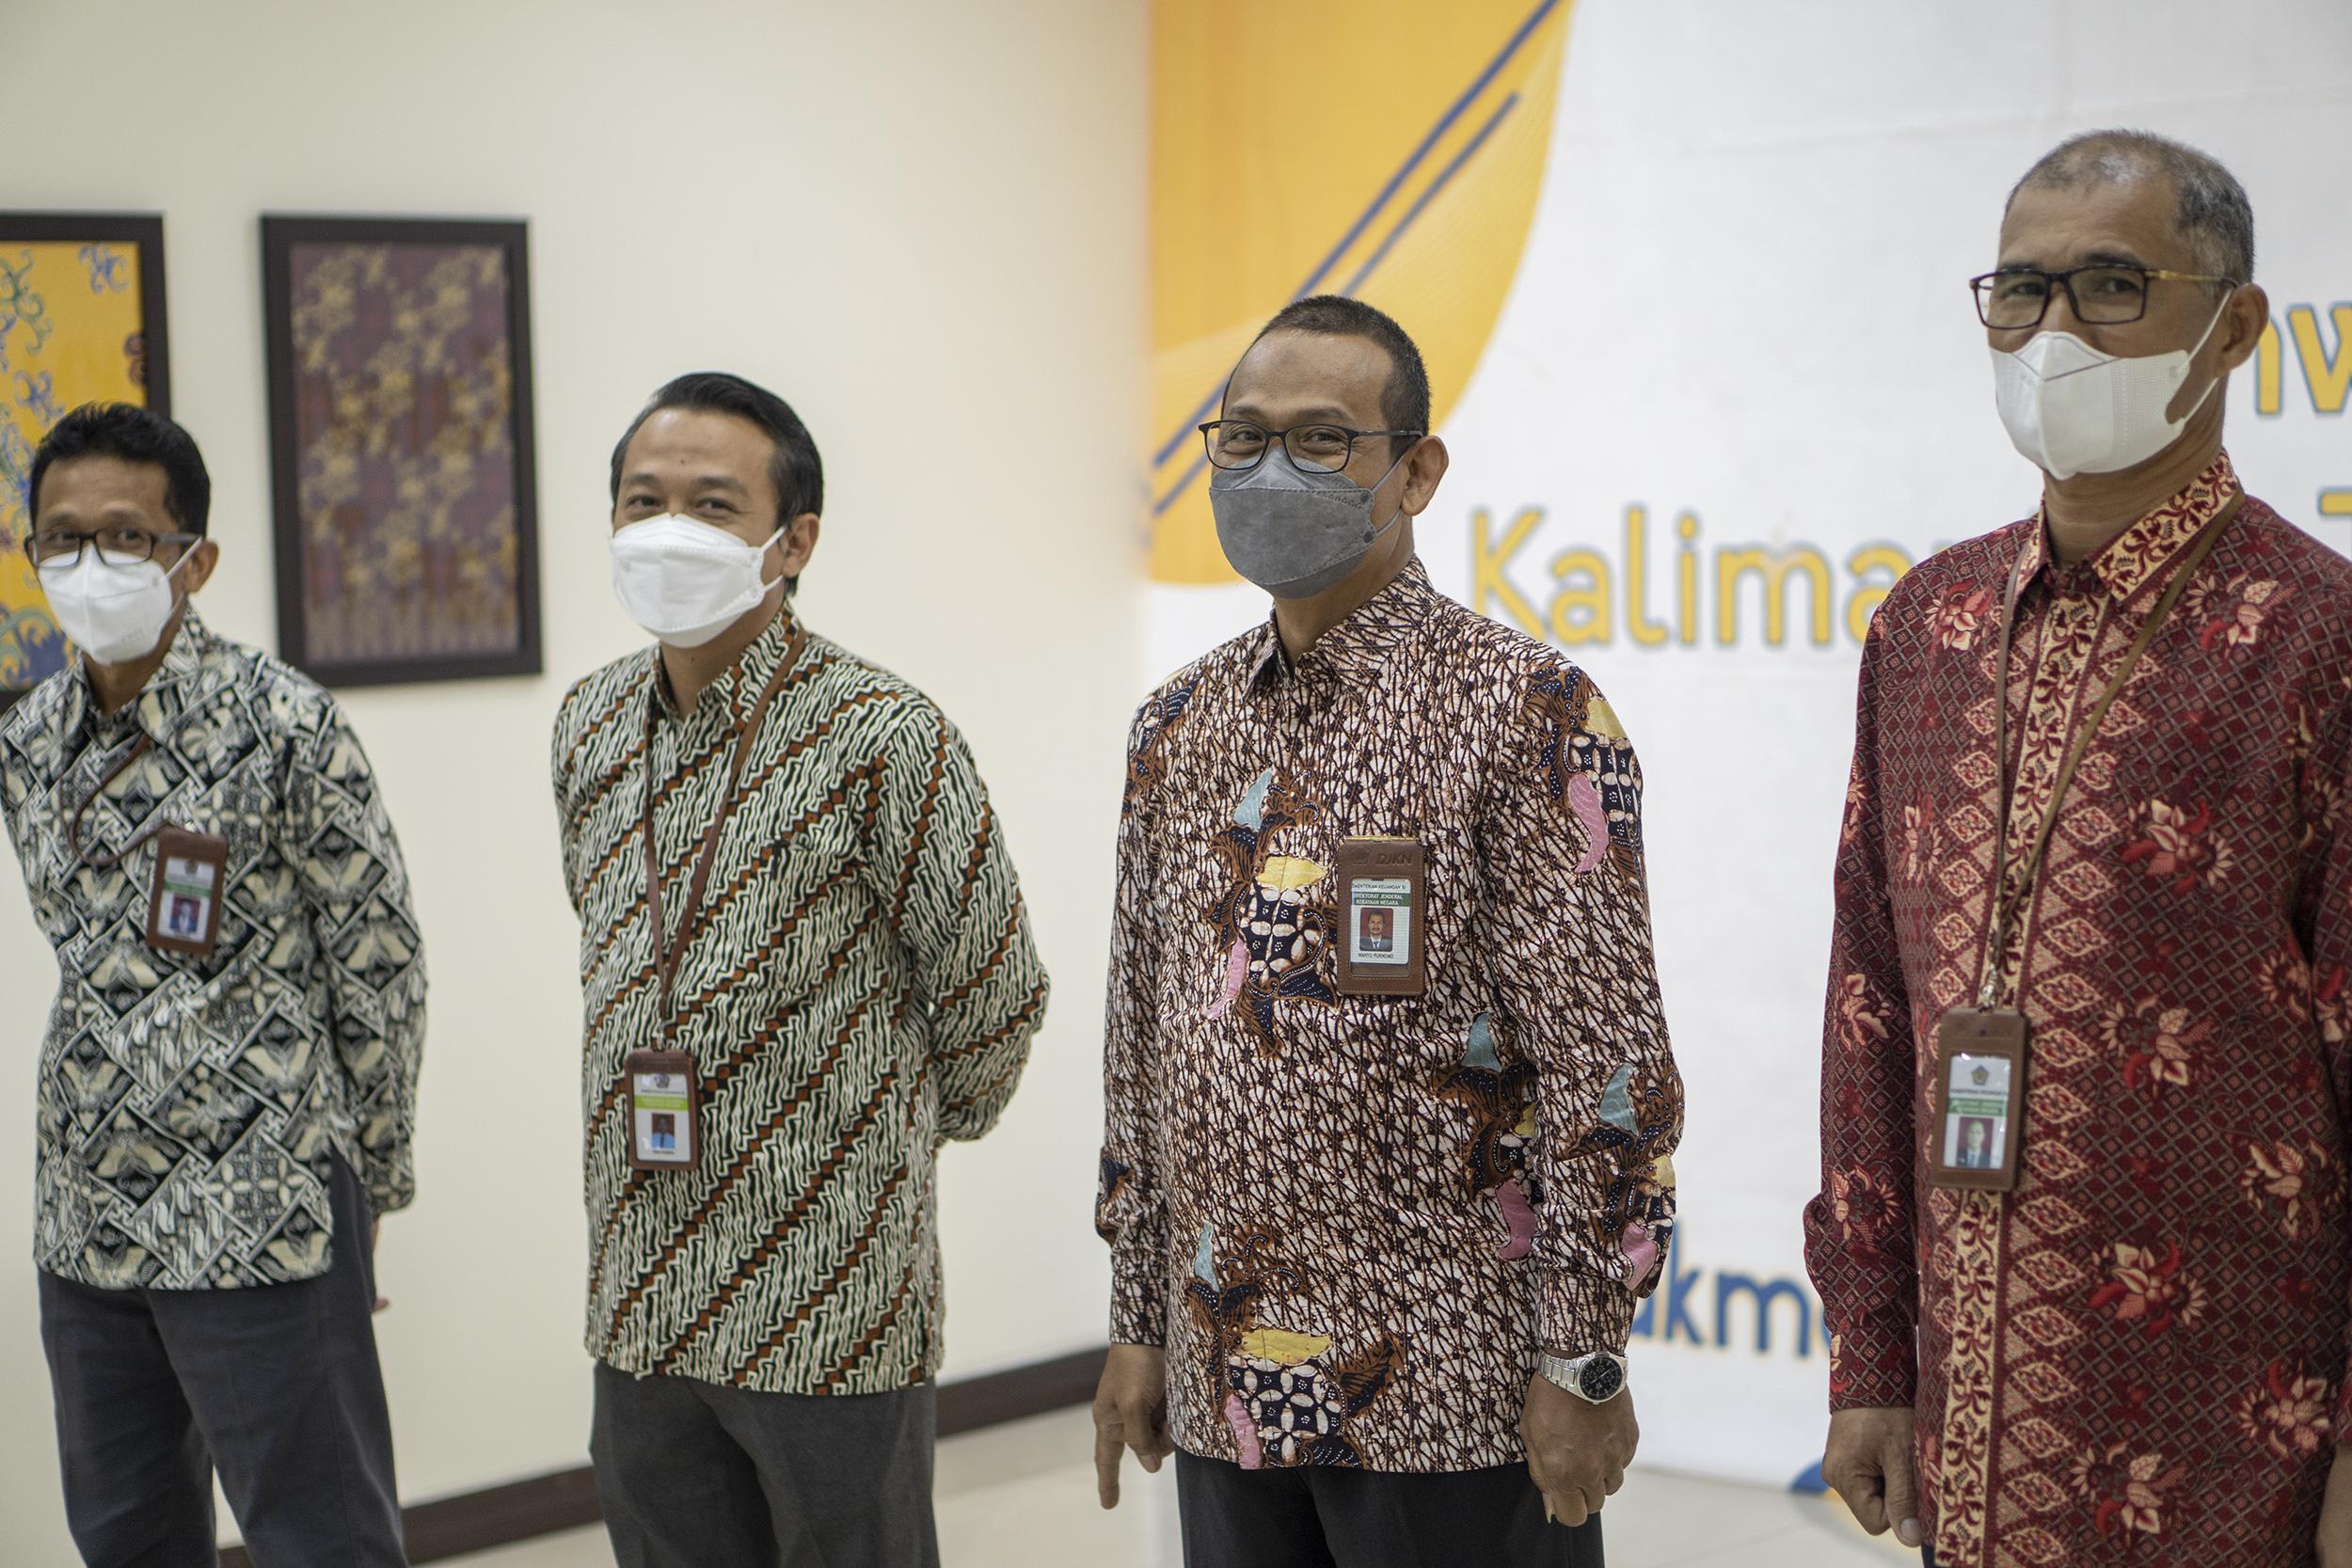 Lantik Pejabat di Lingkungan Kementerian Keuangan, Menkeu Sampaikan Tiga Hal Isi Sumpah Jabatan